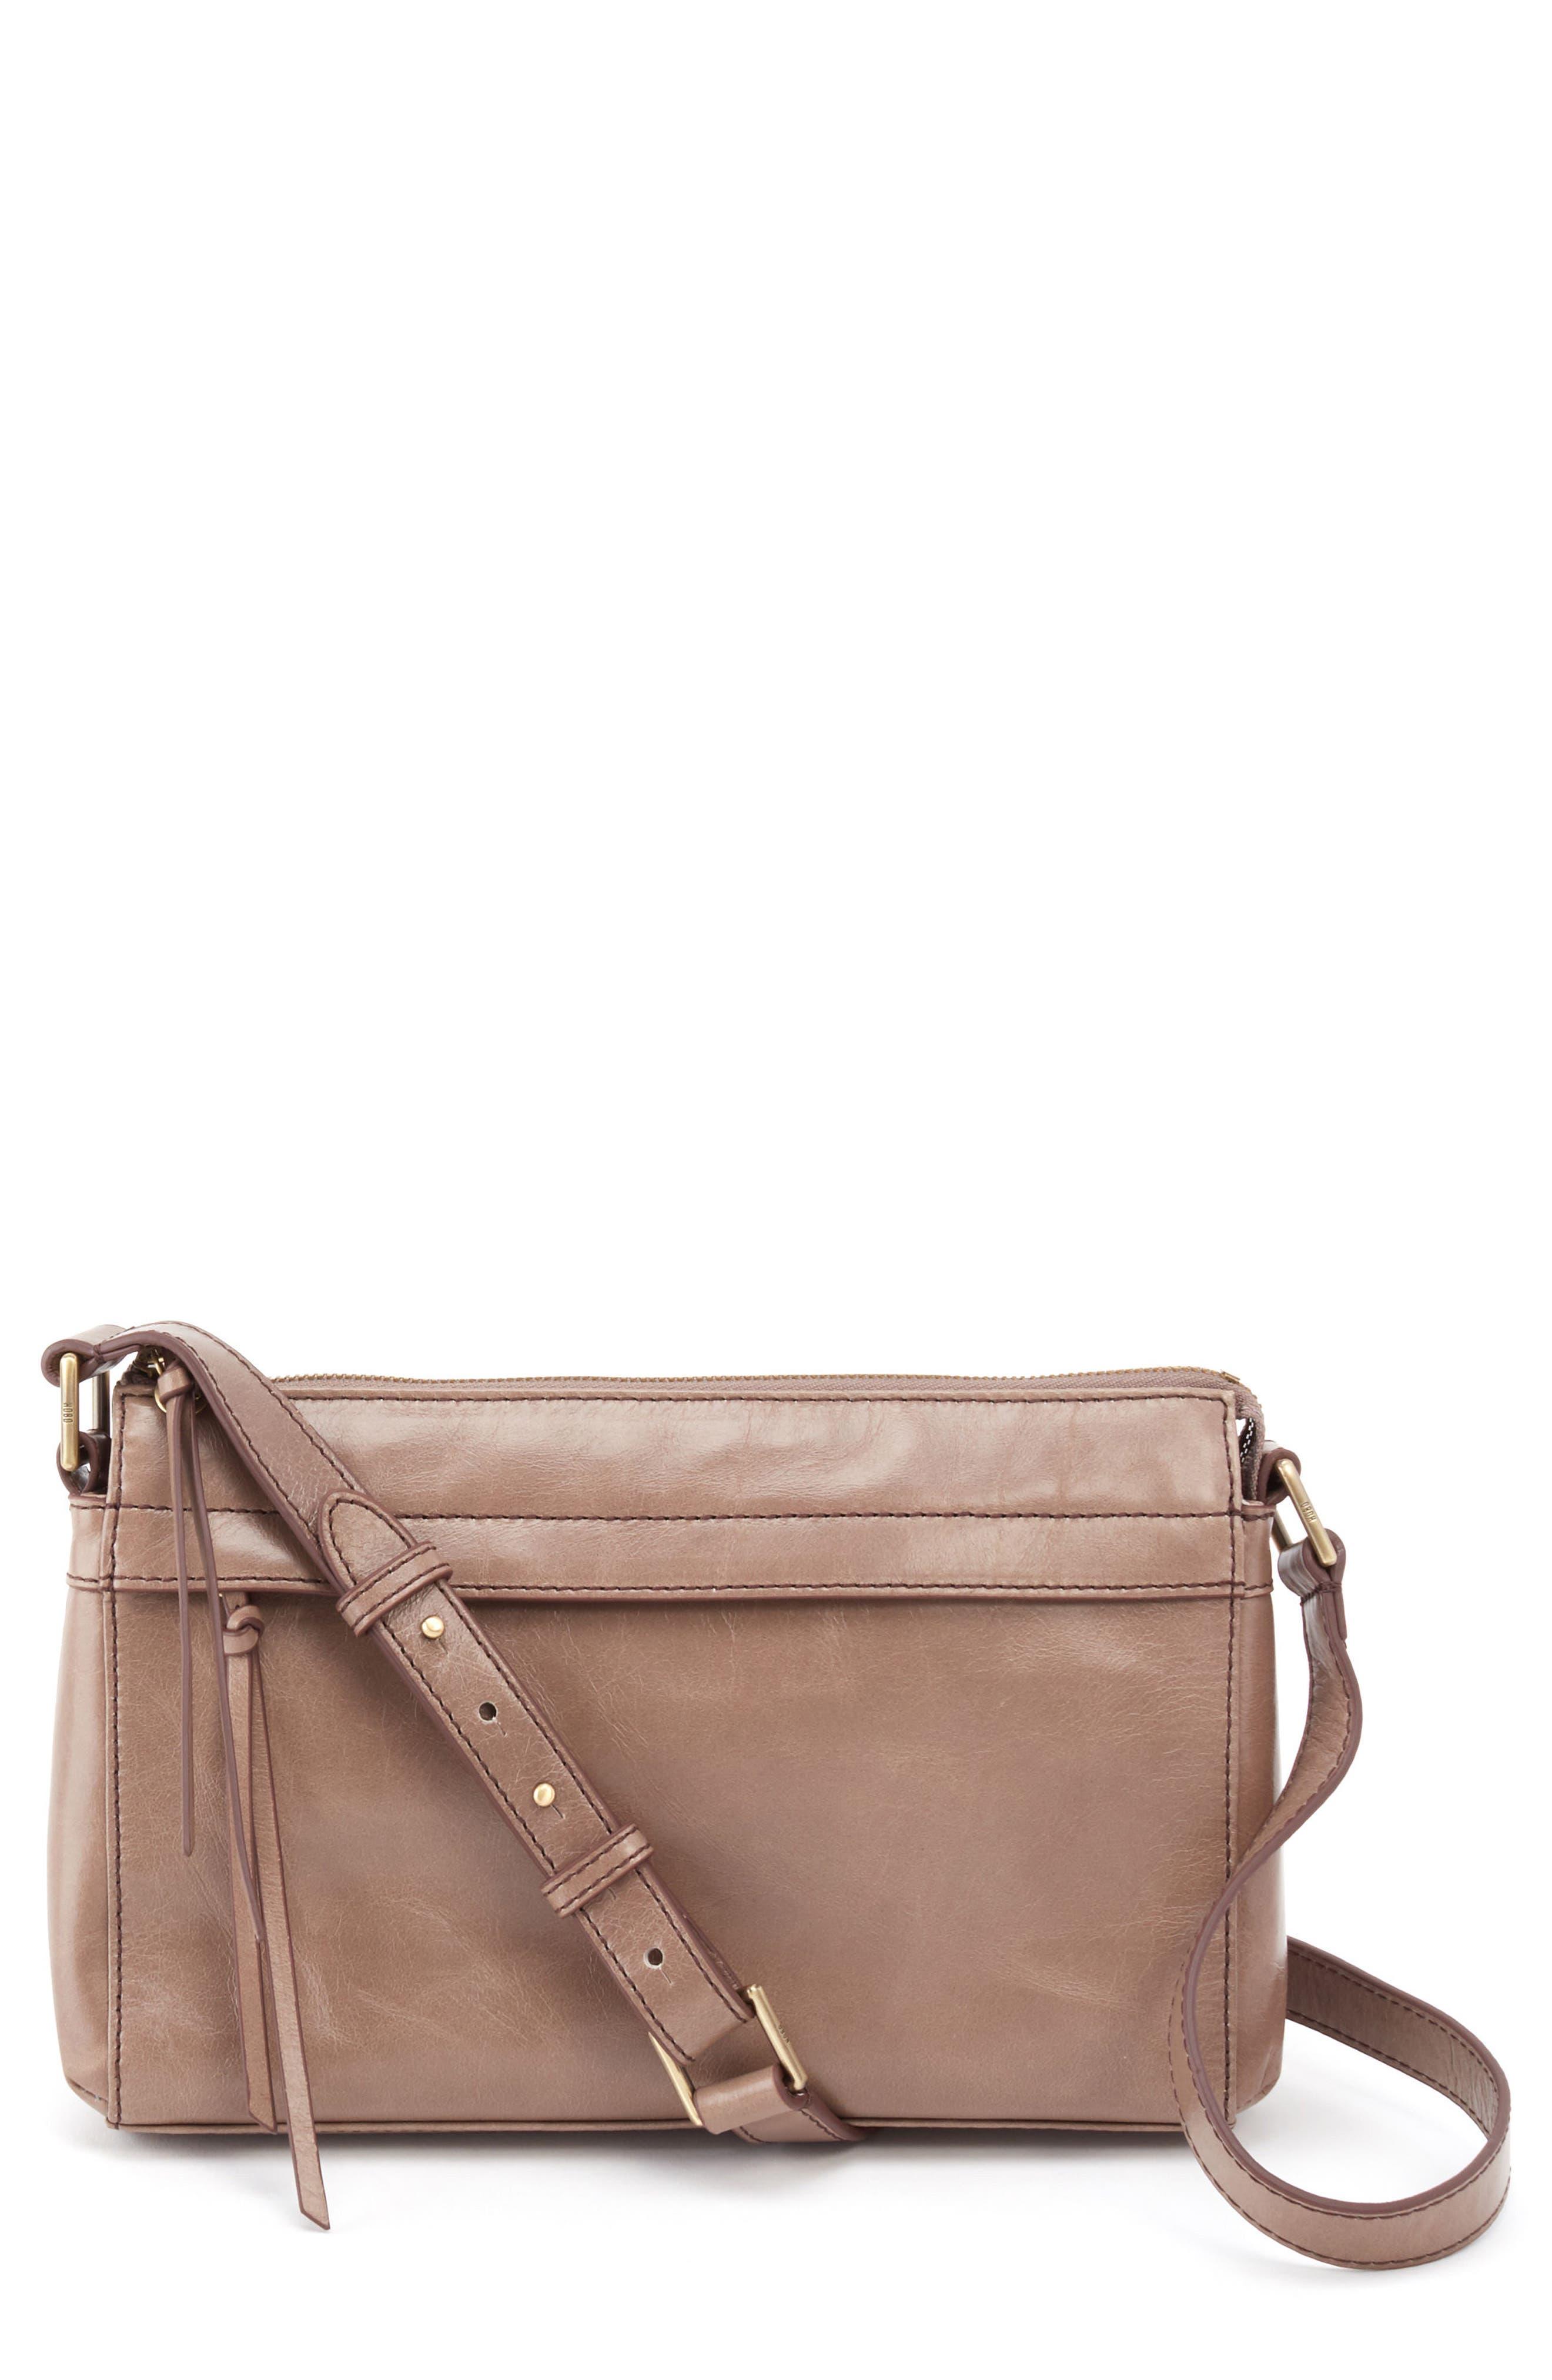 Tobey Leather Crossbody Bag,                             Main thumbnail 1, color,                             Ash